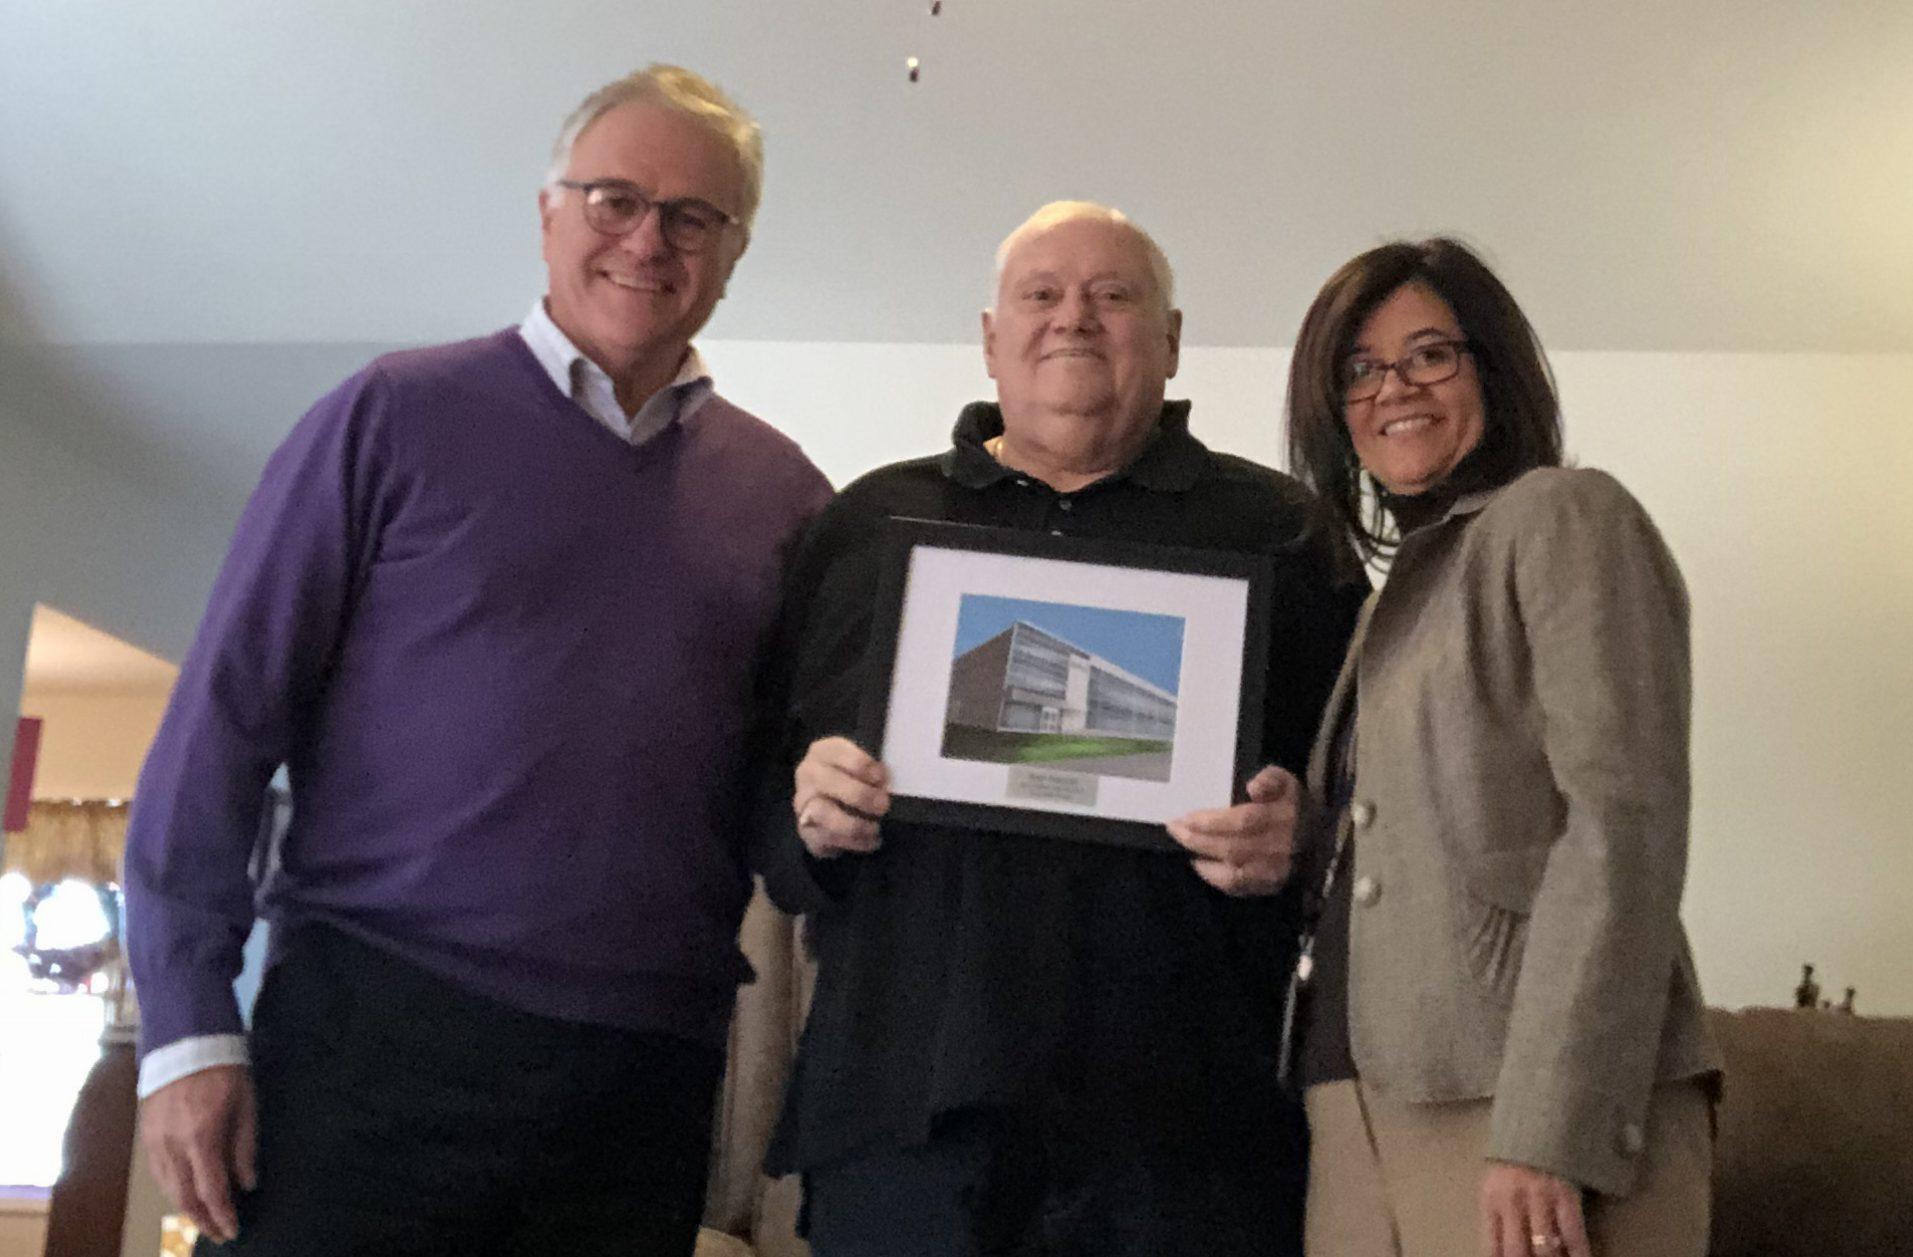 Photo of Jim Baldwin, Paul Puccio and Dr. Gladys I. Cruz